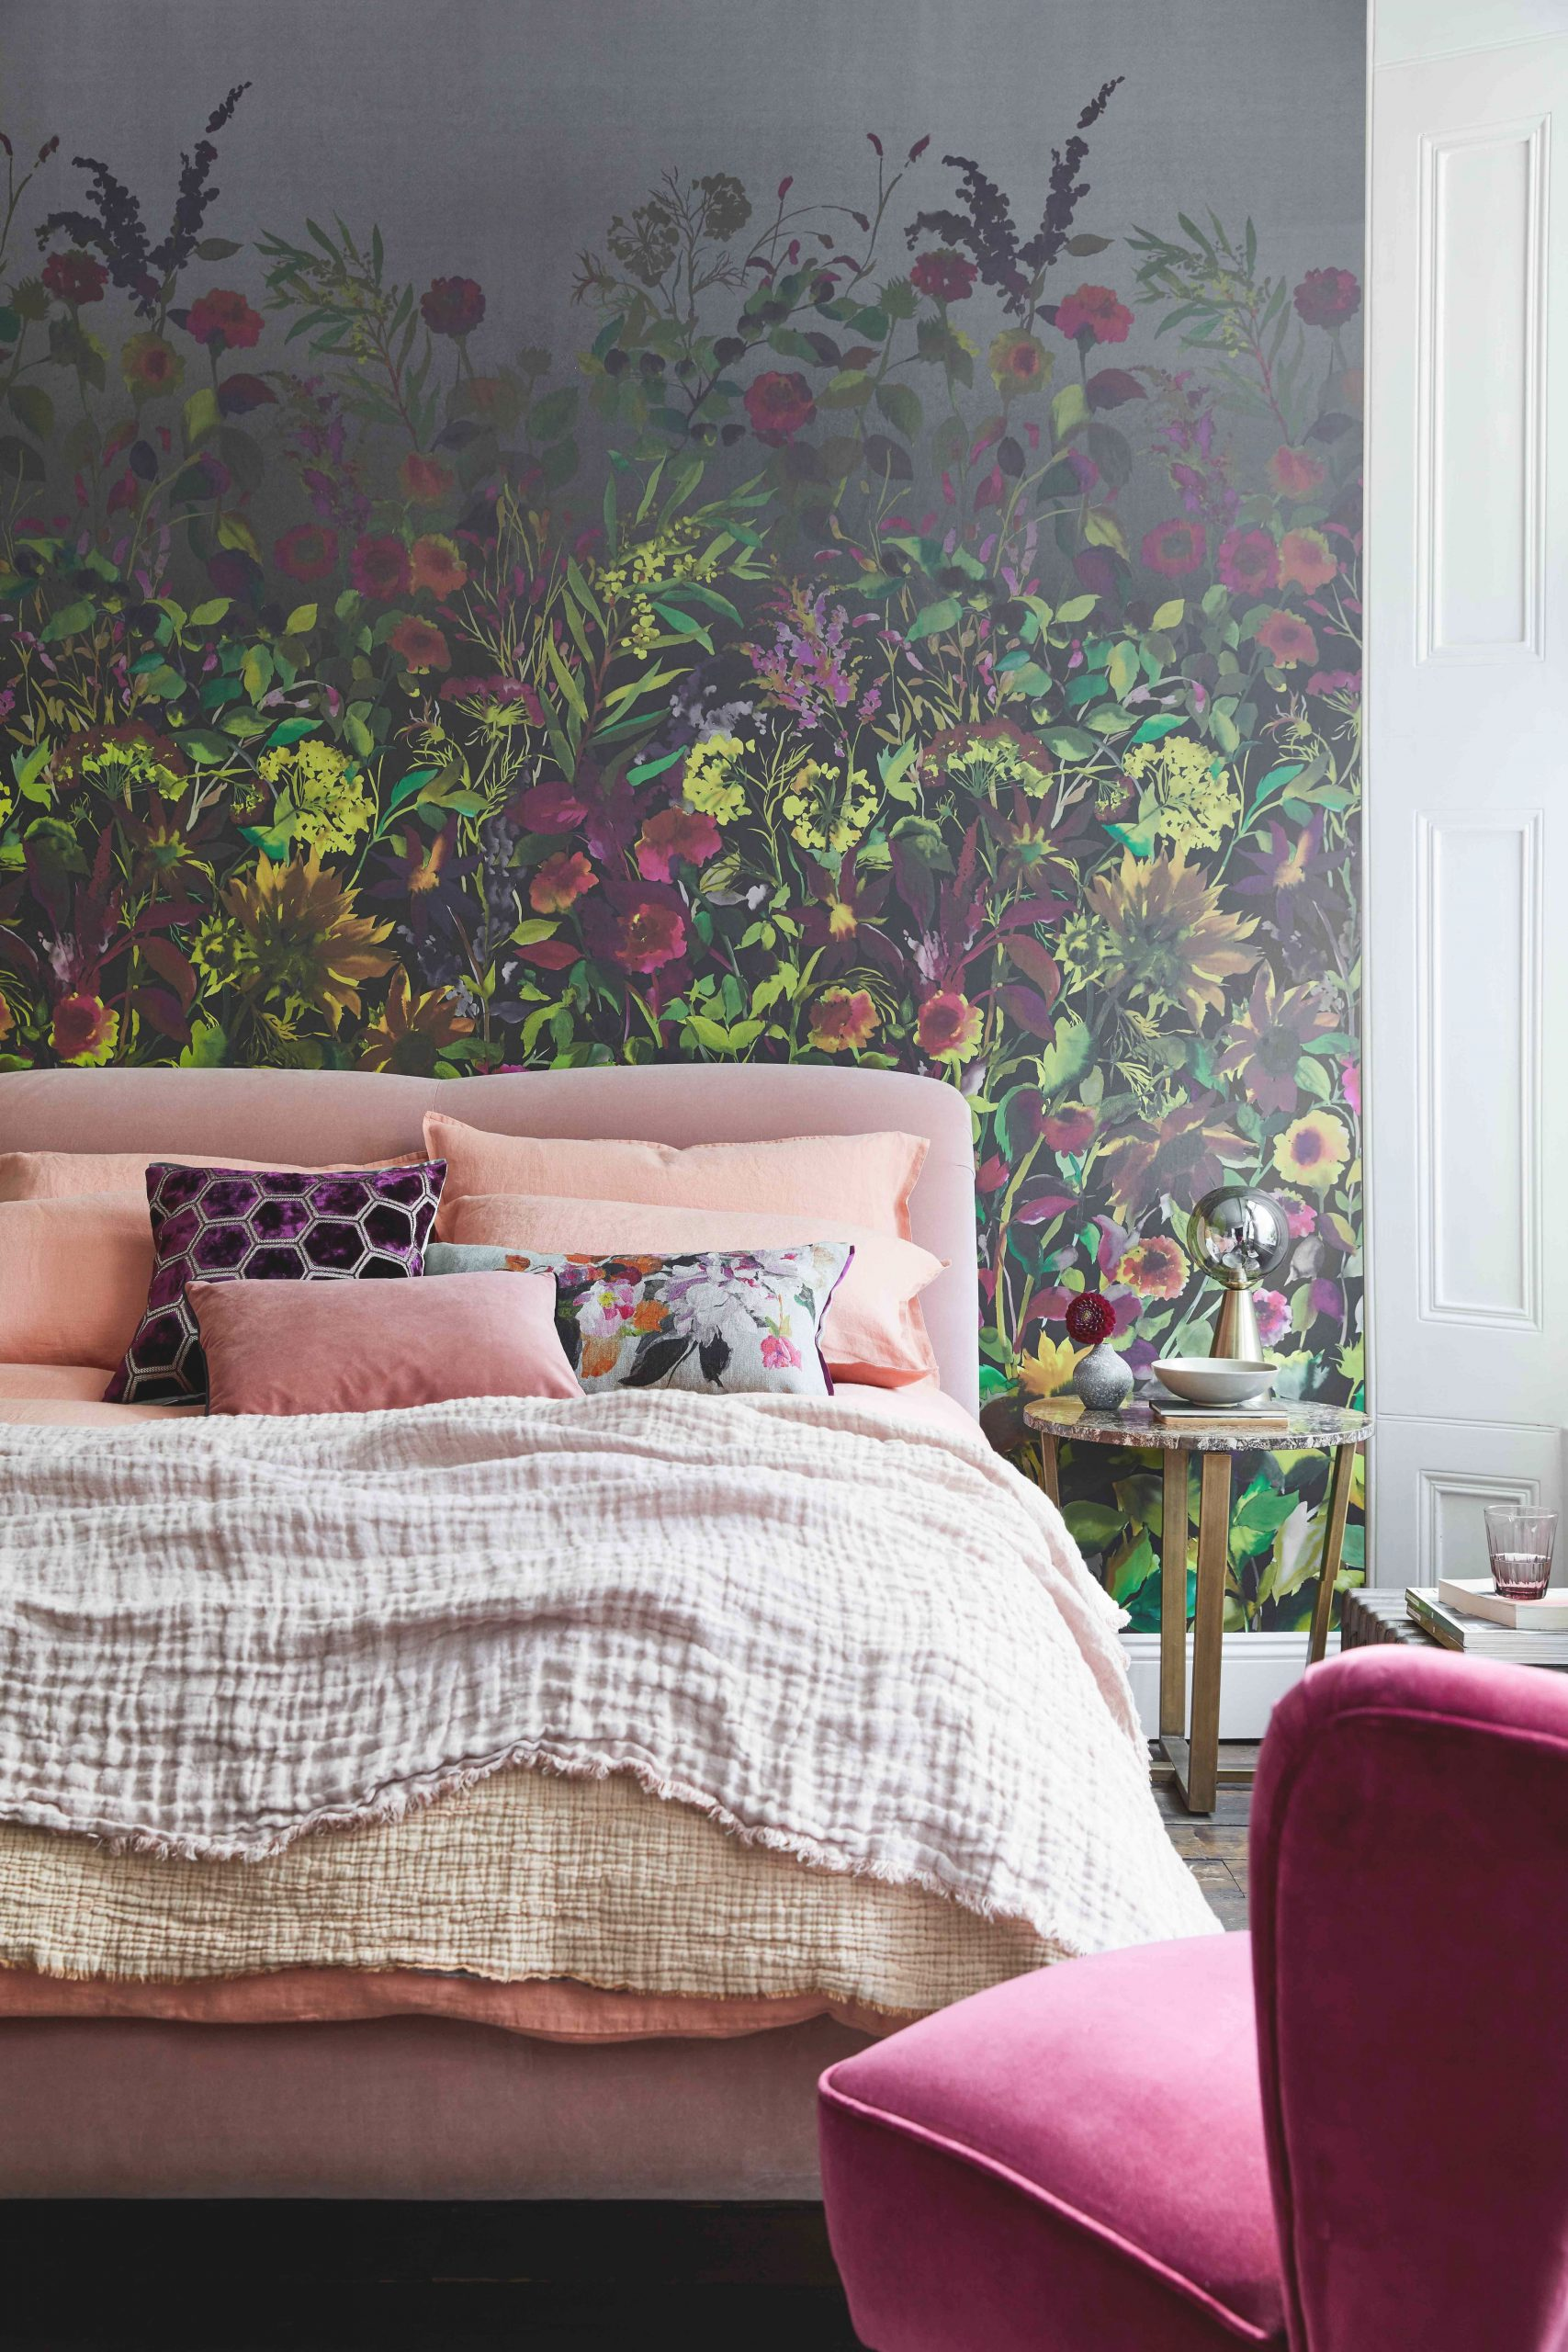 40 Beautiful Bedroom Decorating Ideas – Modern Bedroom Ideas in Beautiful Decoration For Bedrooms Ideas